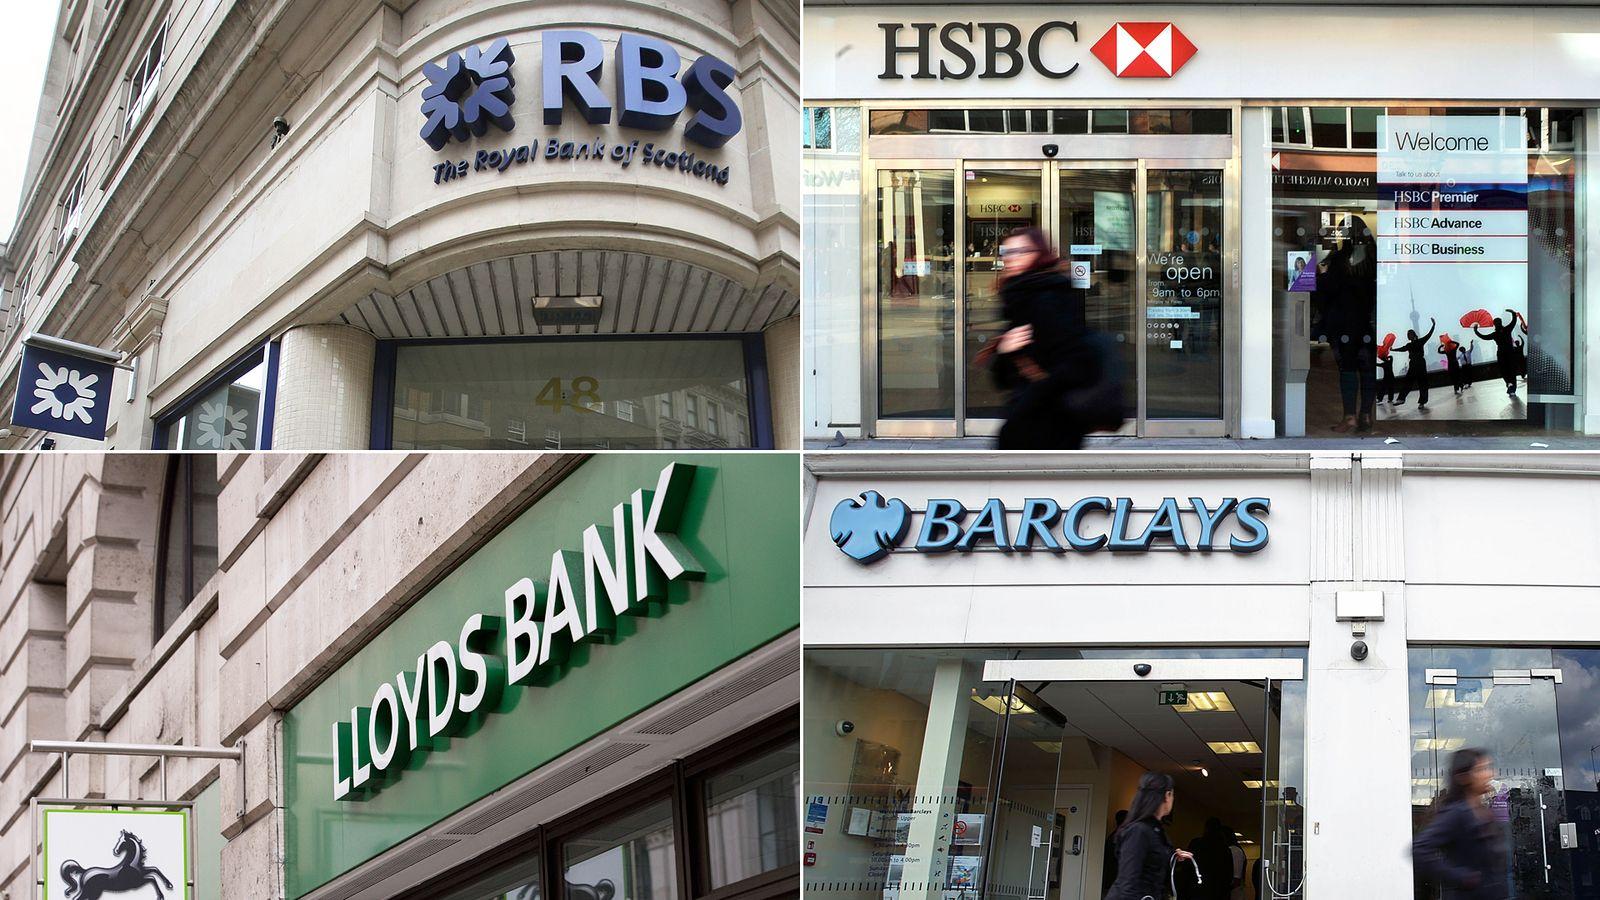 Big banks stop shareholder dividends because of coronavirus - EpicNews